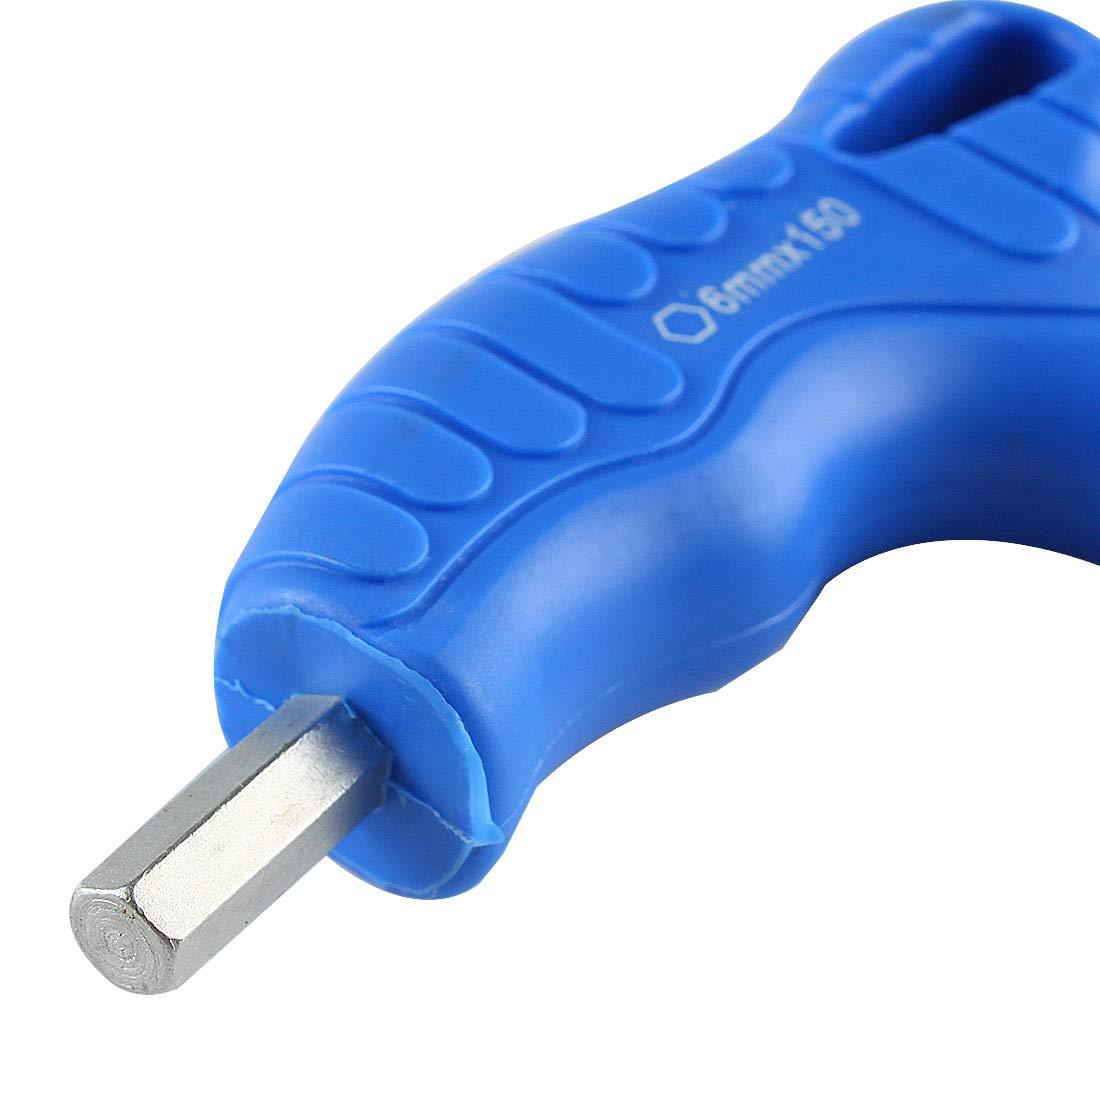 3mm Andux Zone Innensechskantschl/üssel Blau T-Griff CR-V Sechskant Metrischschl/üssel Sechskantschl/üssel flaches Ende NLJBS-07